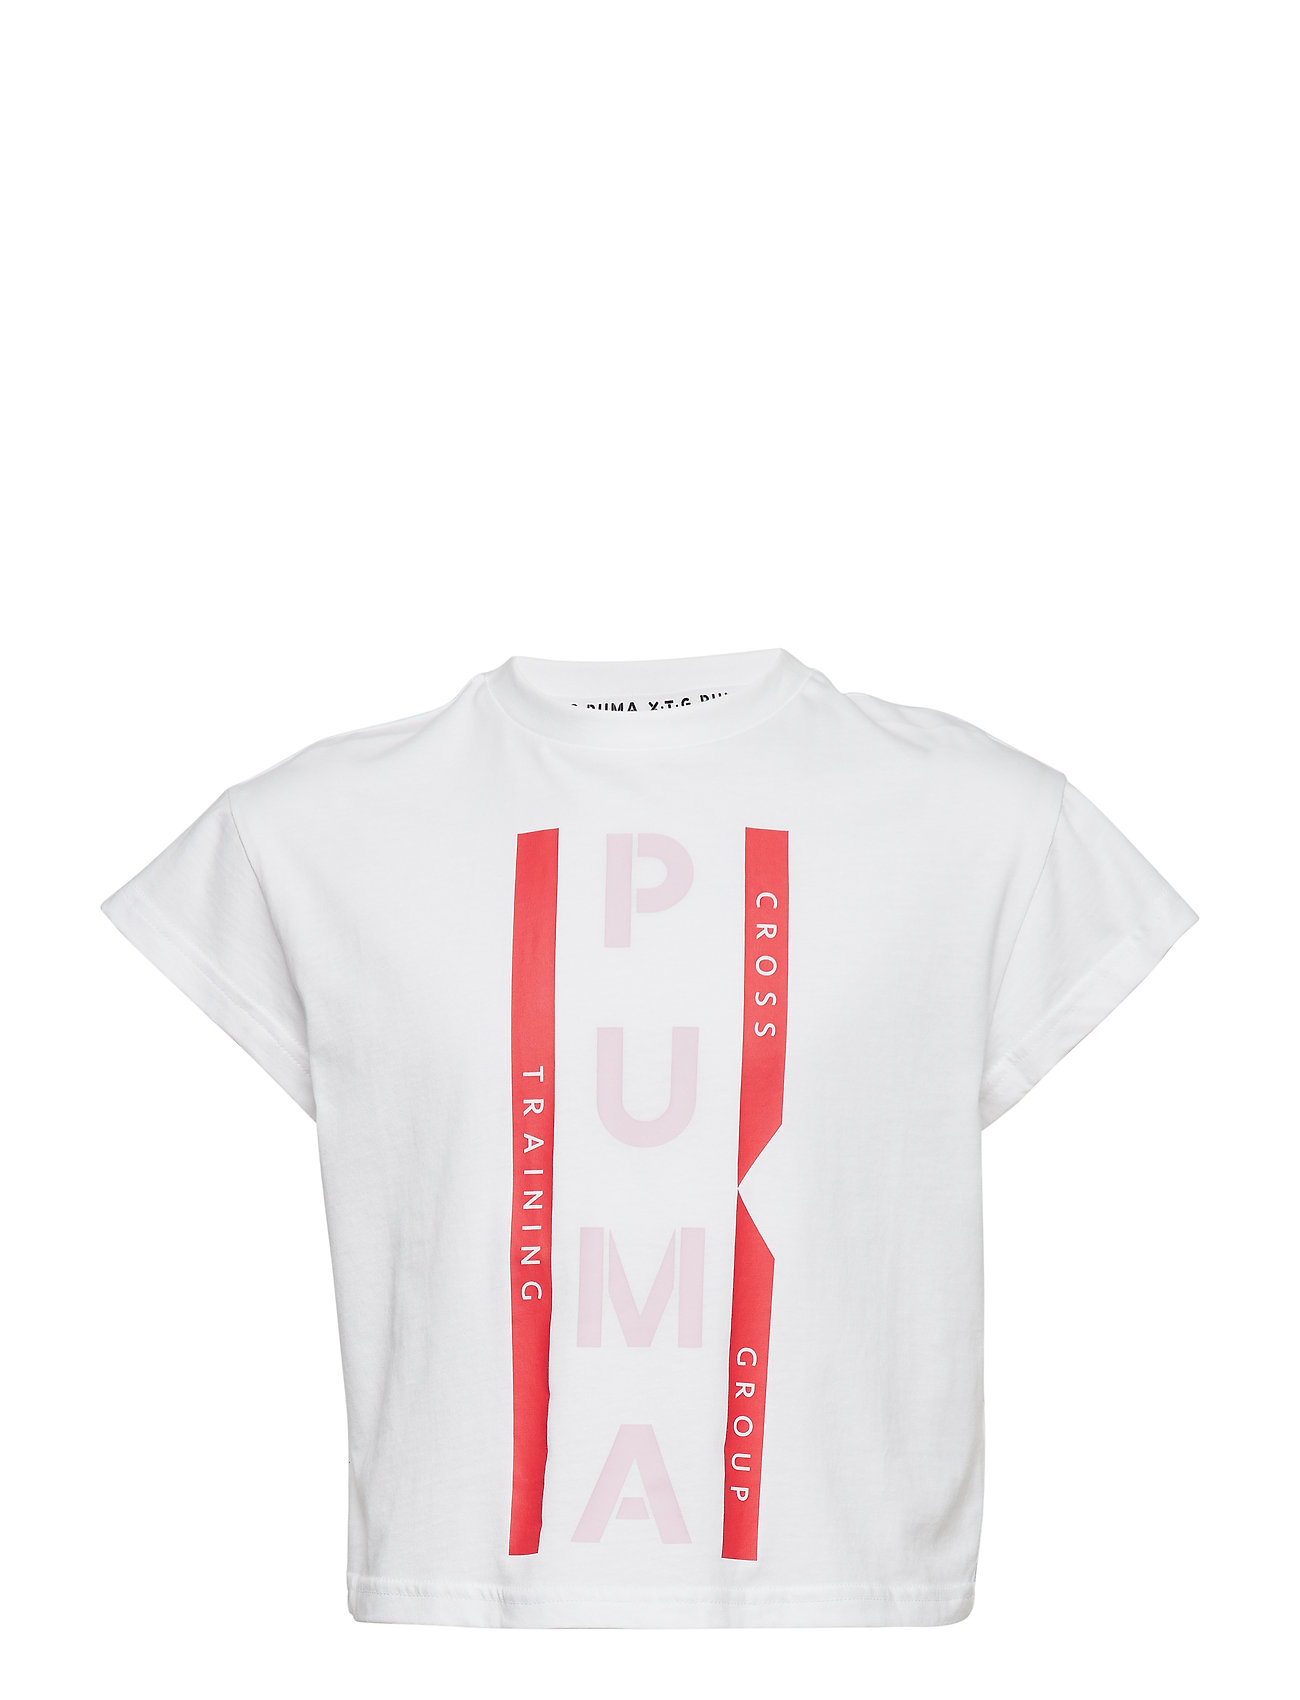 PUMA PUMA XTG Graphic Tee G - PUMA WHITE